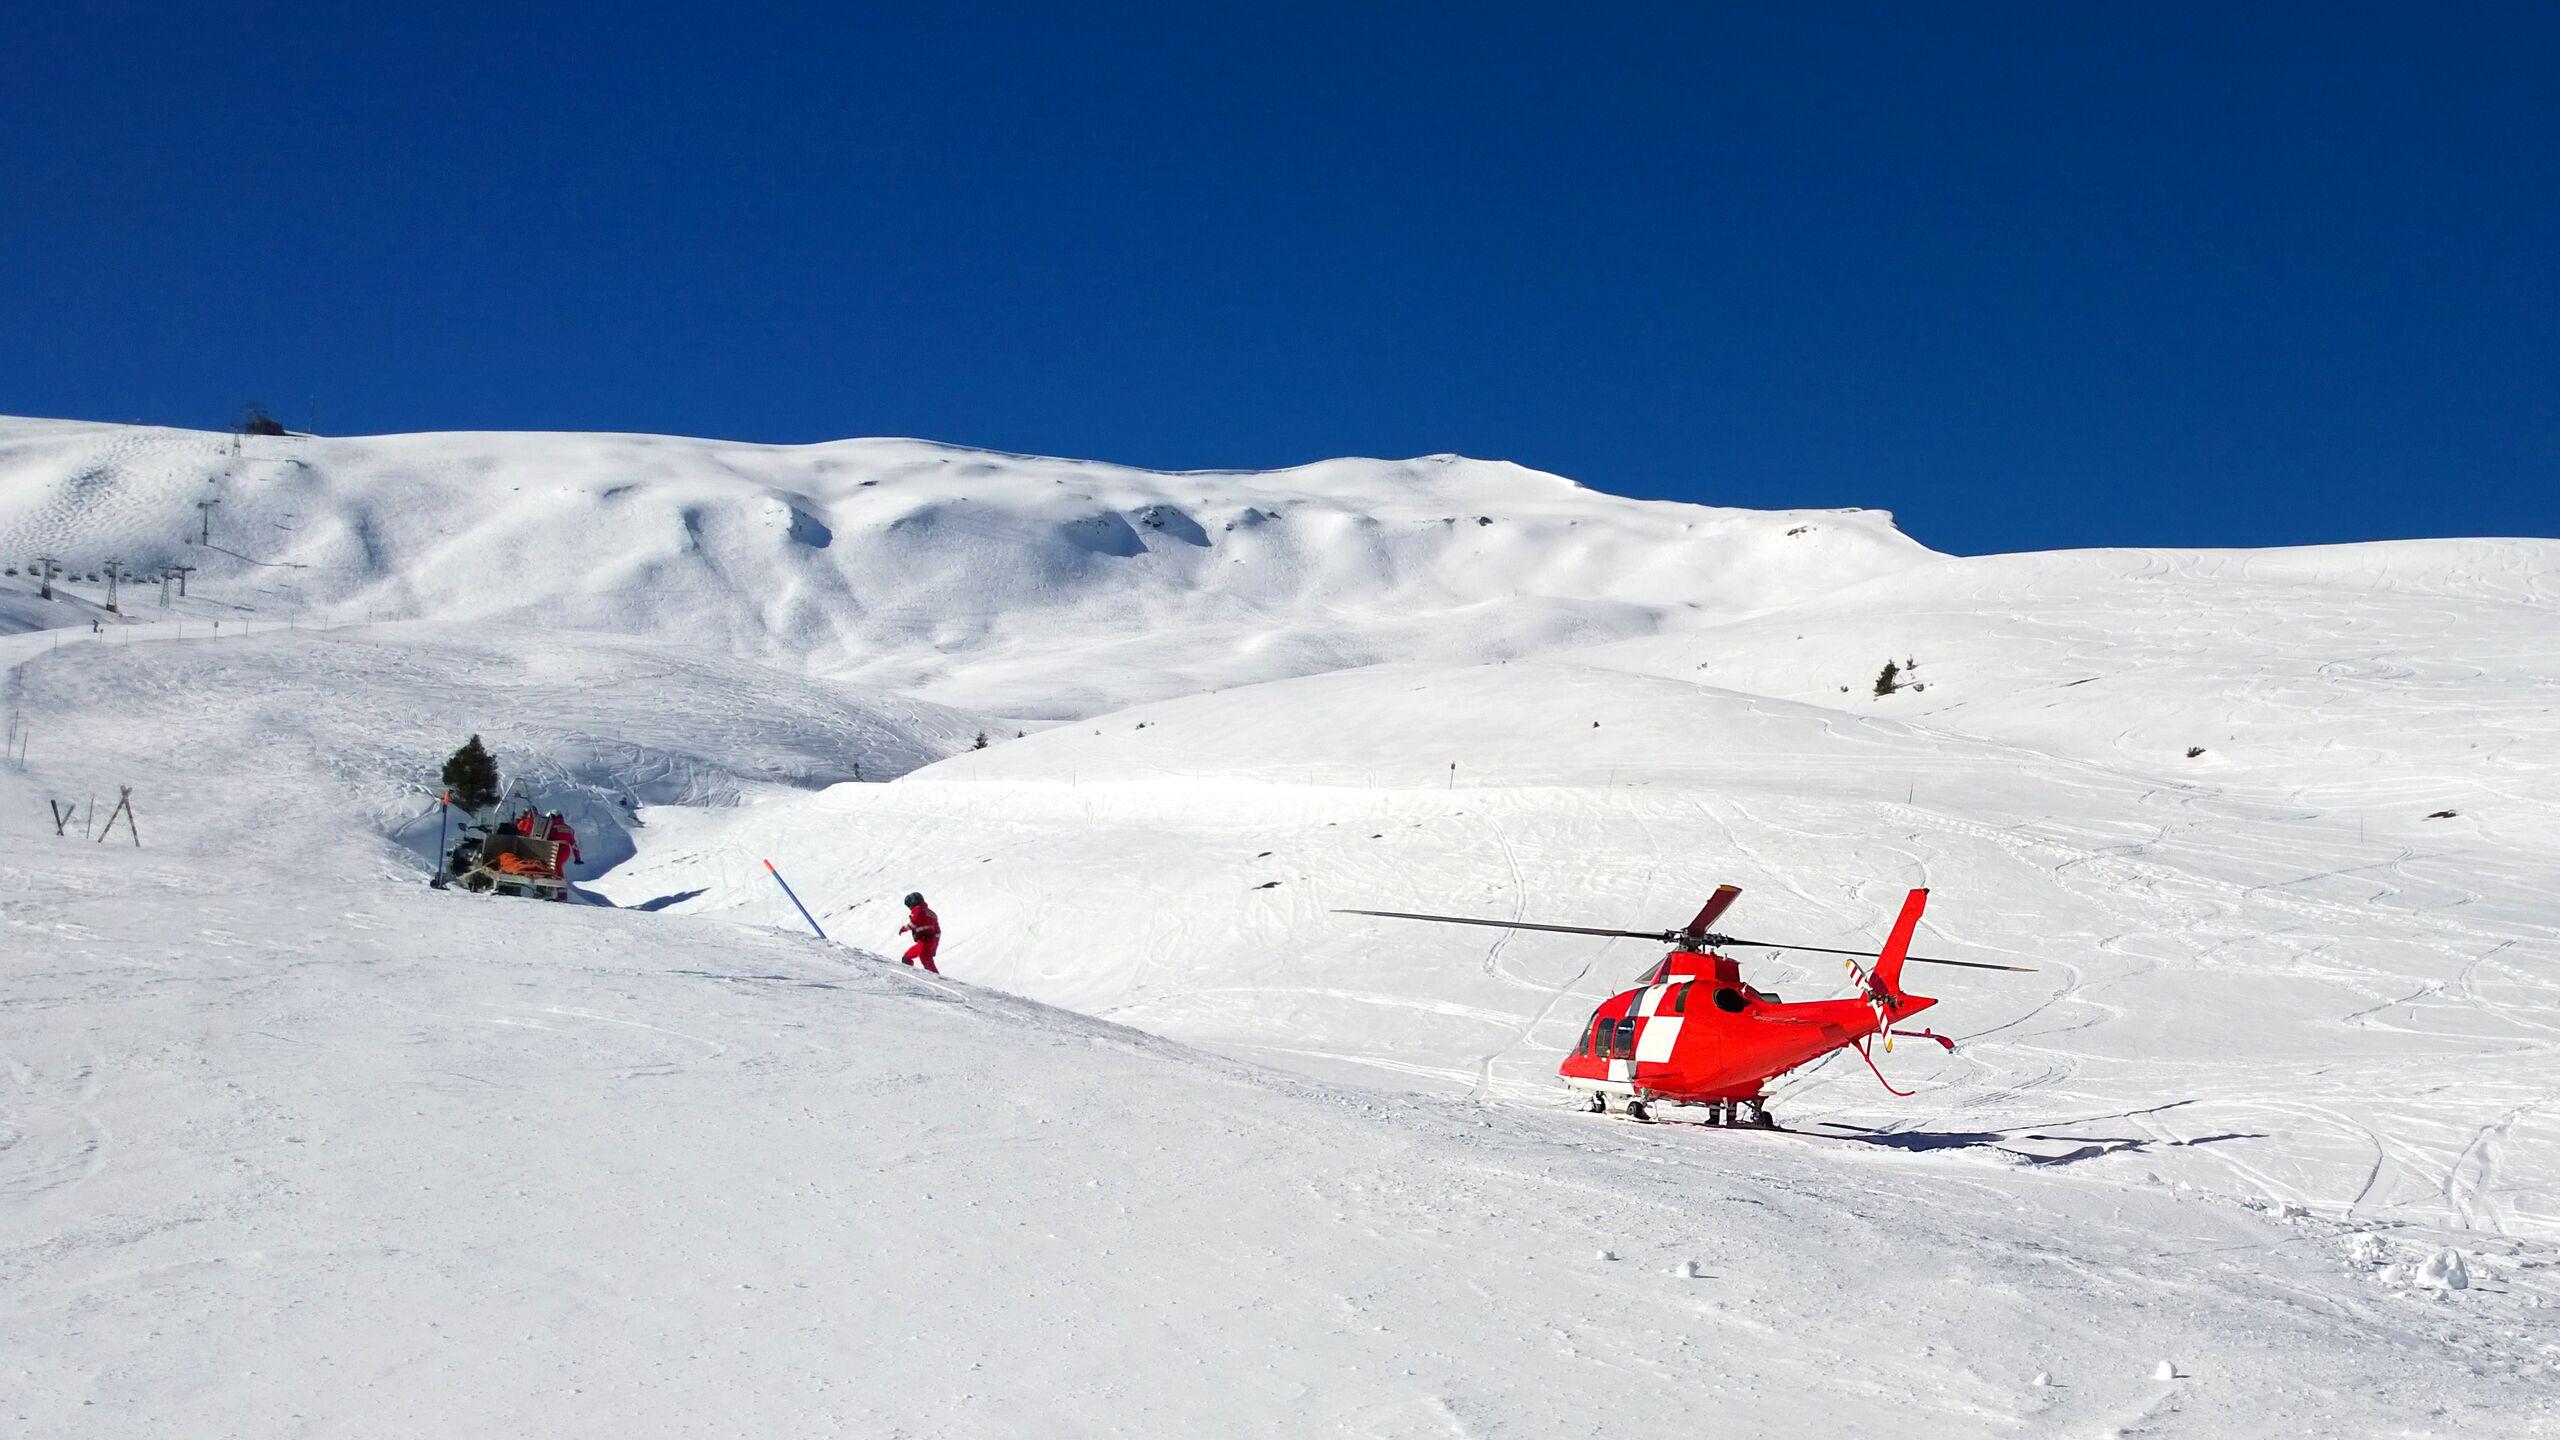 AXA Luxembourg : vacances au ski, ne assistance indispensable